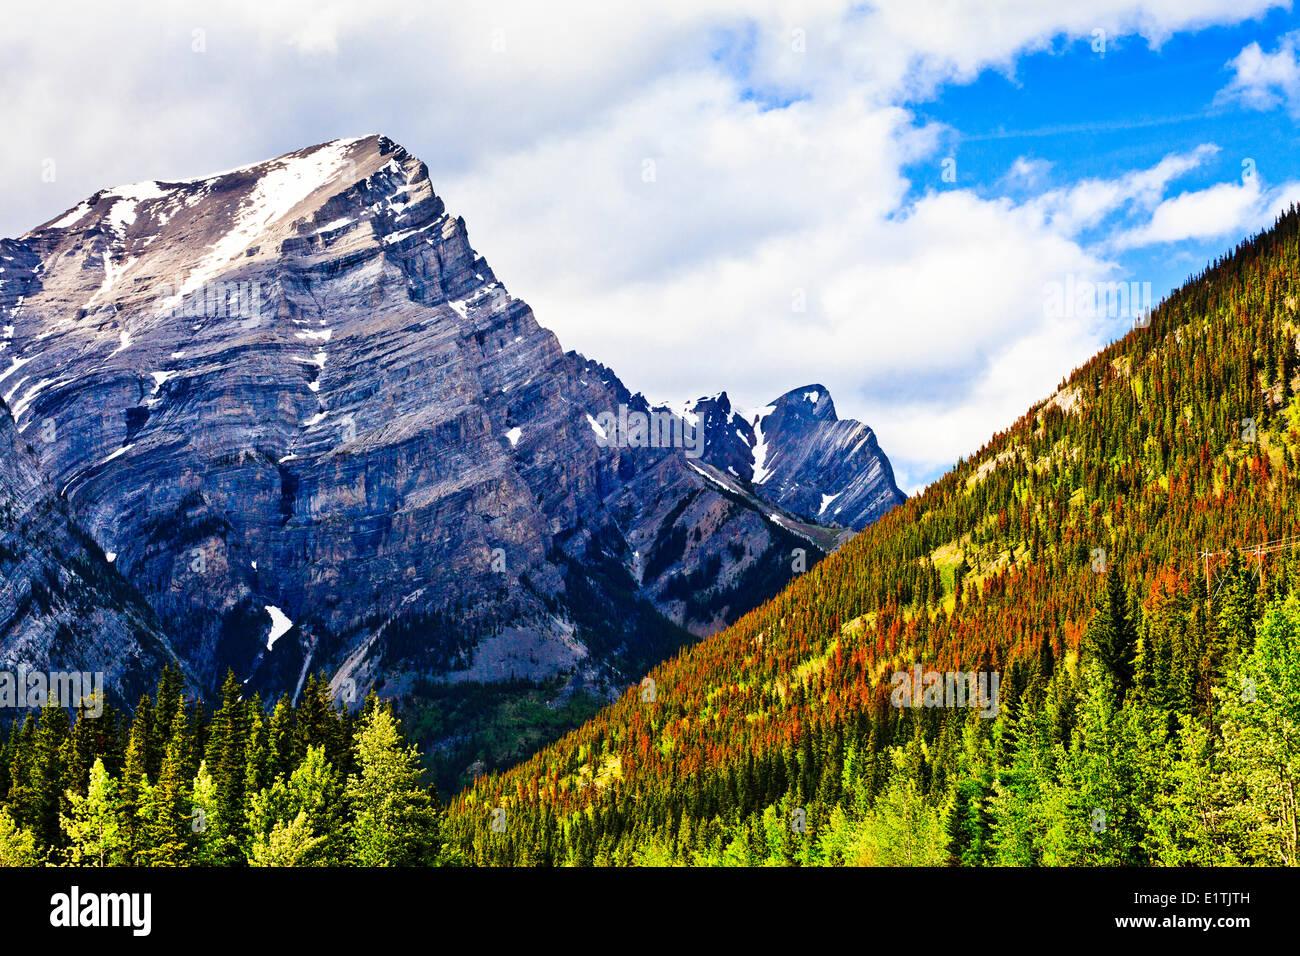 Mountain in Kananaskis Country Alberta, with pine beetle-killed trees. - Stock Image